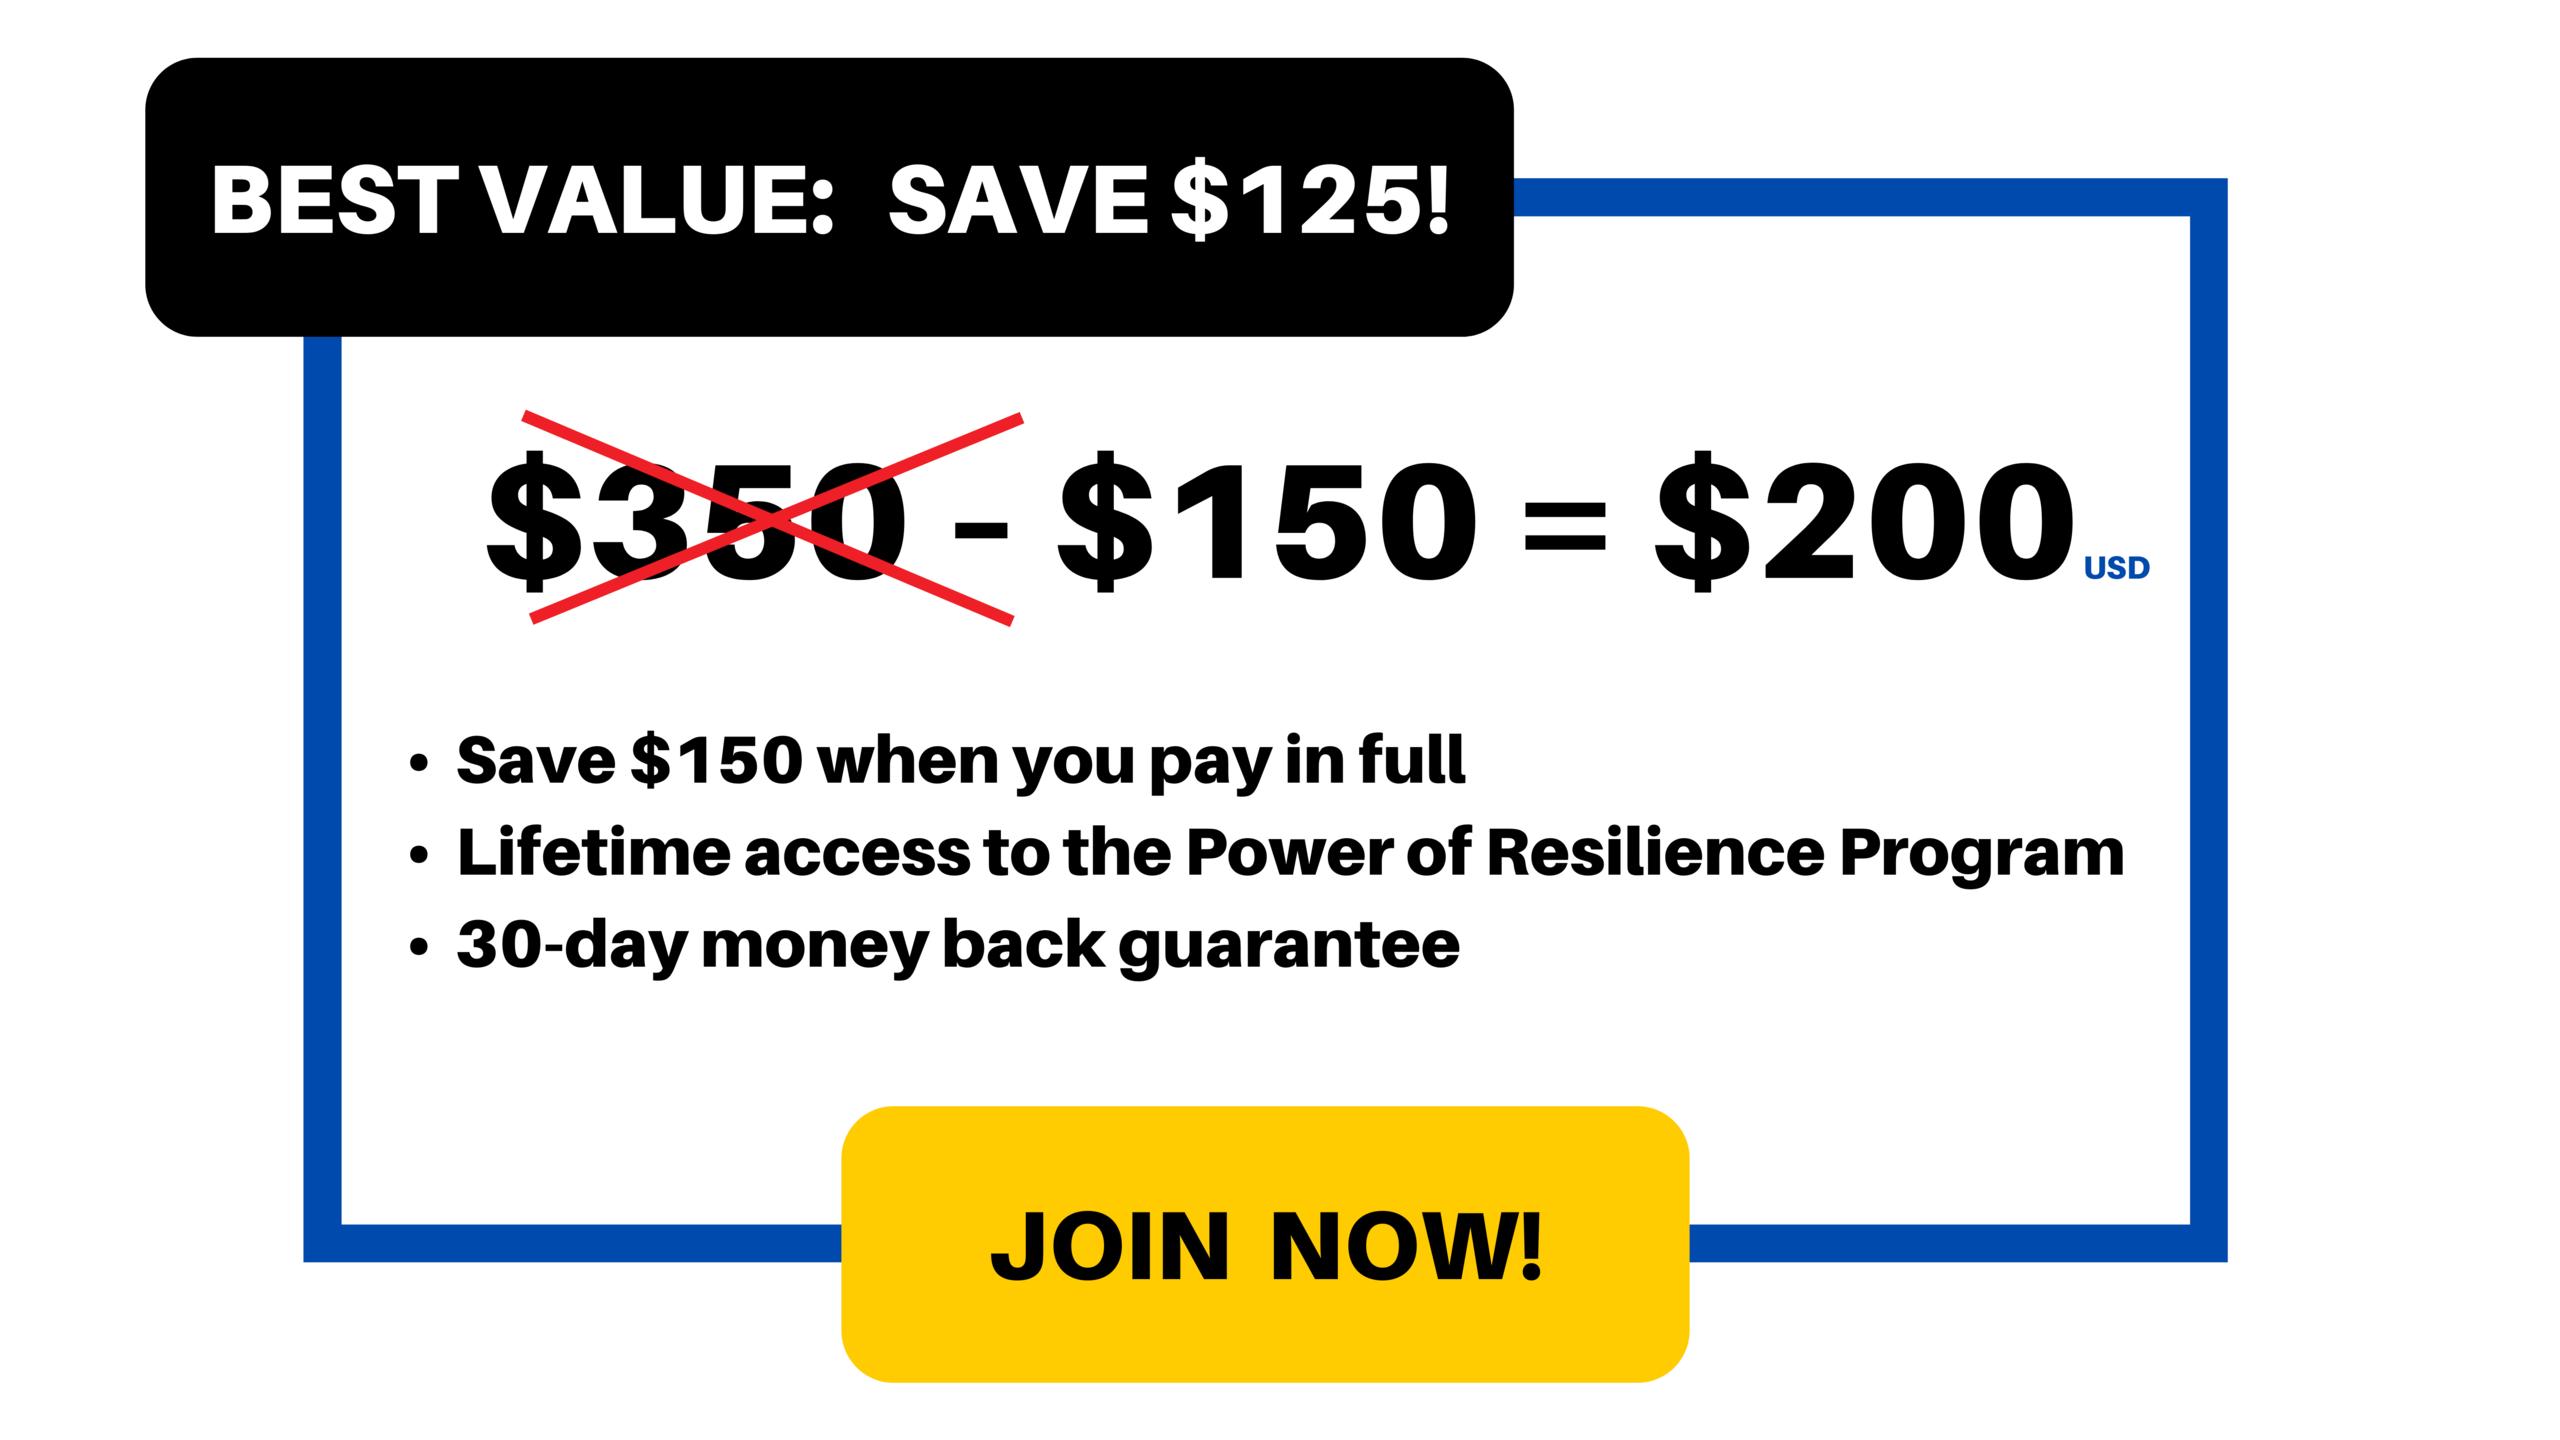 Best Value: $200